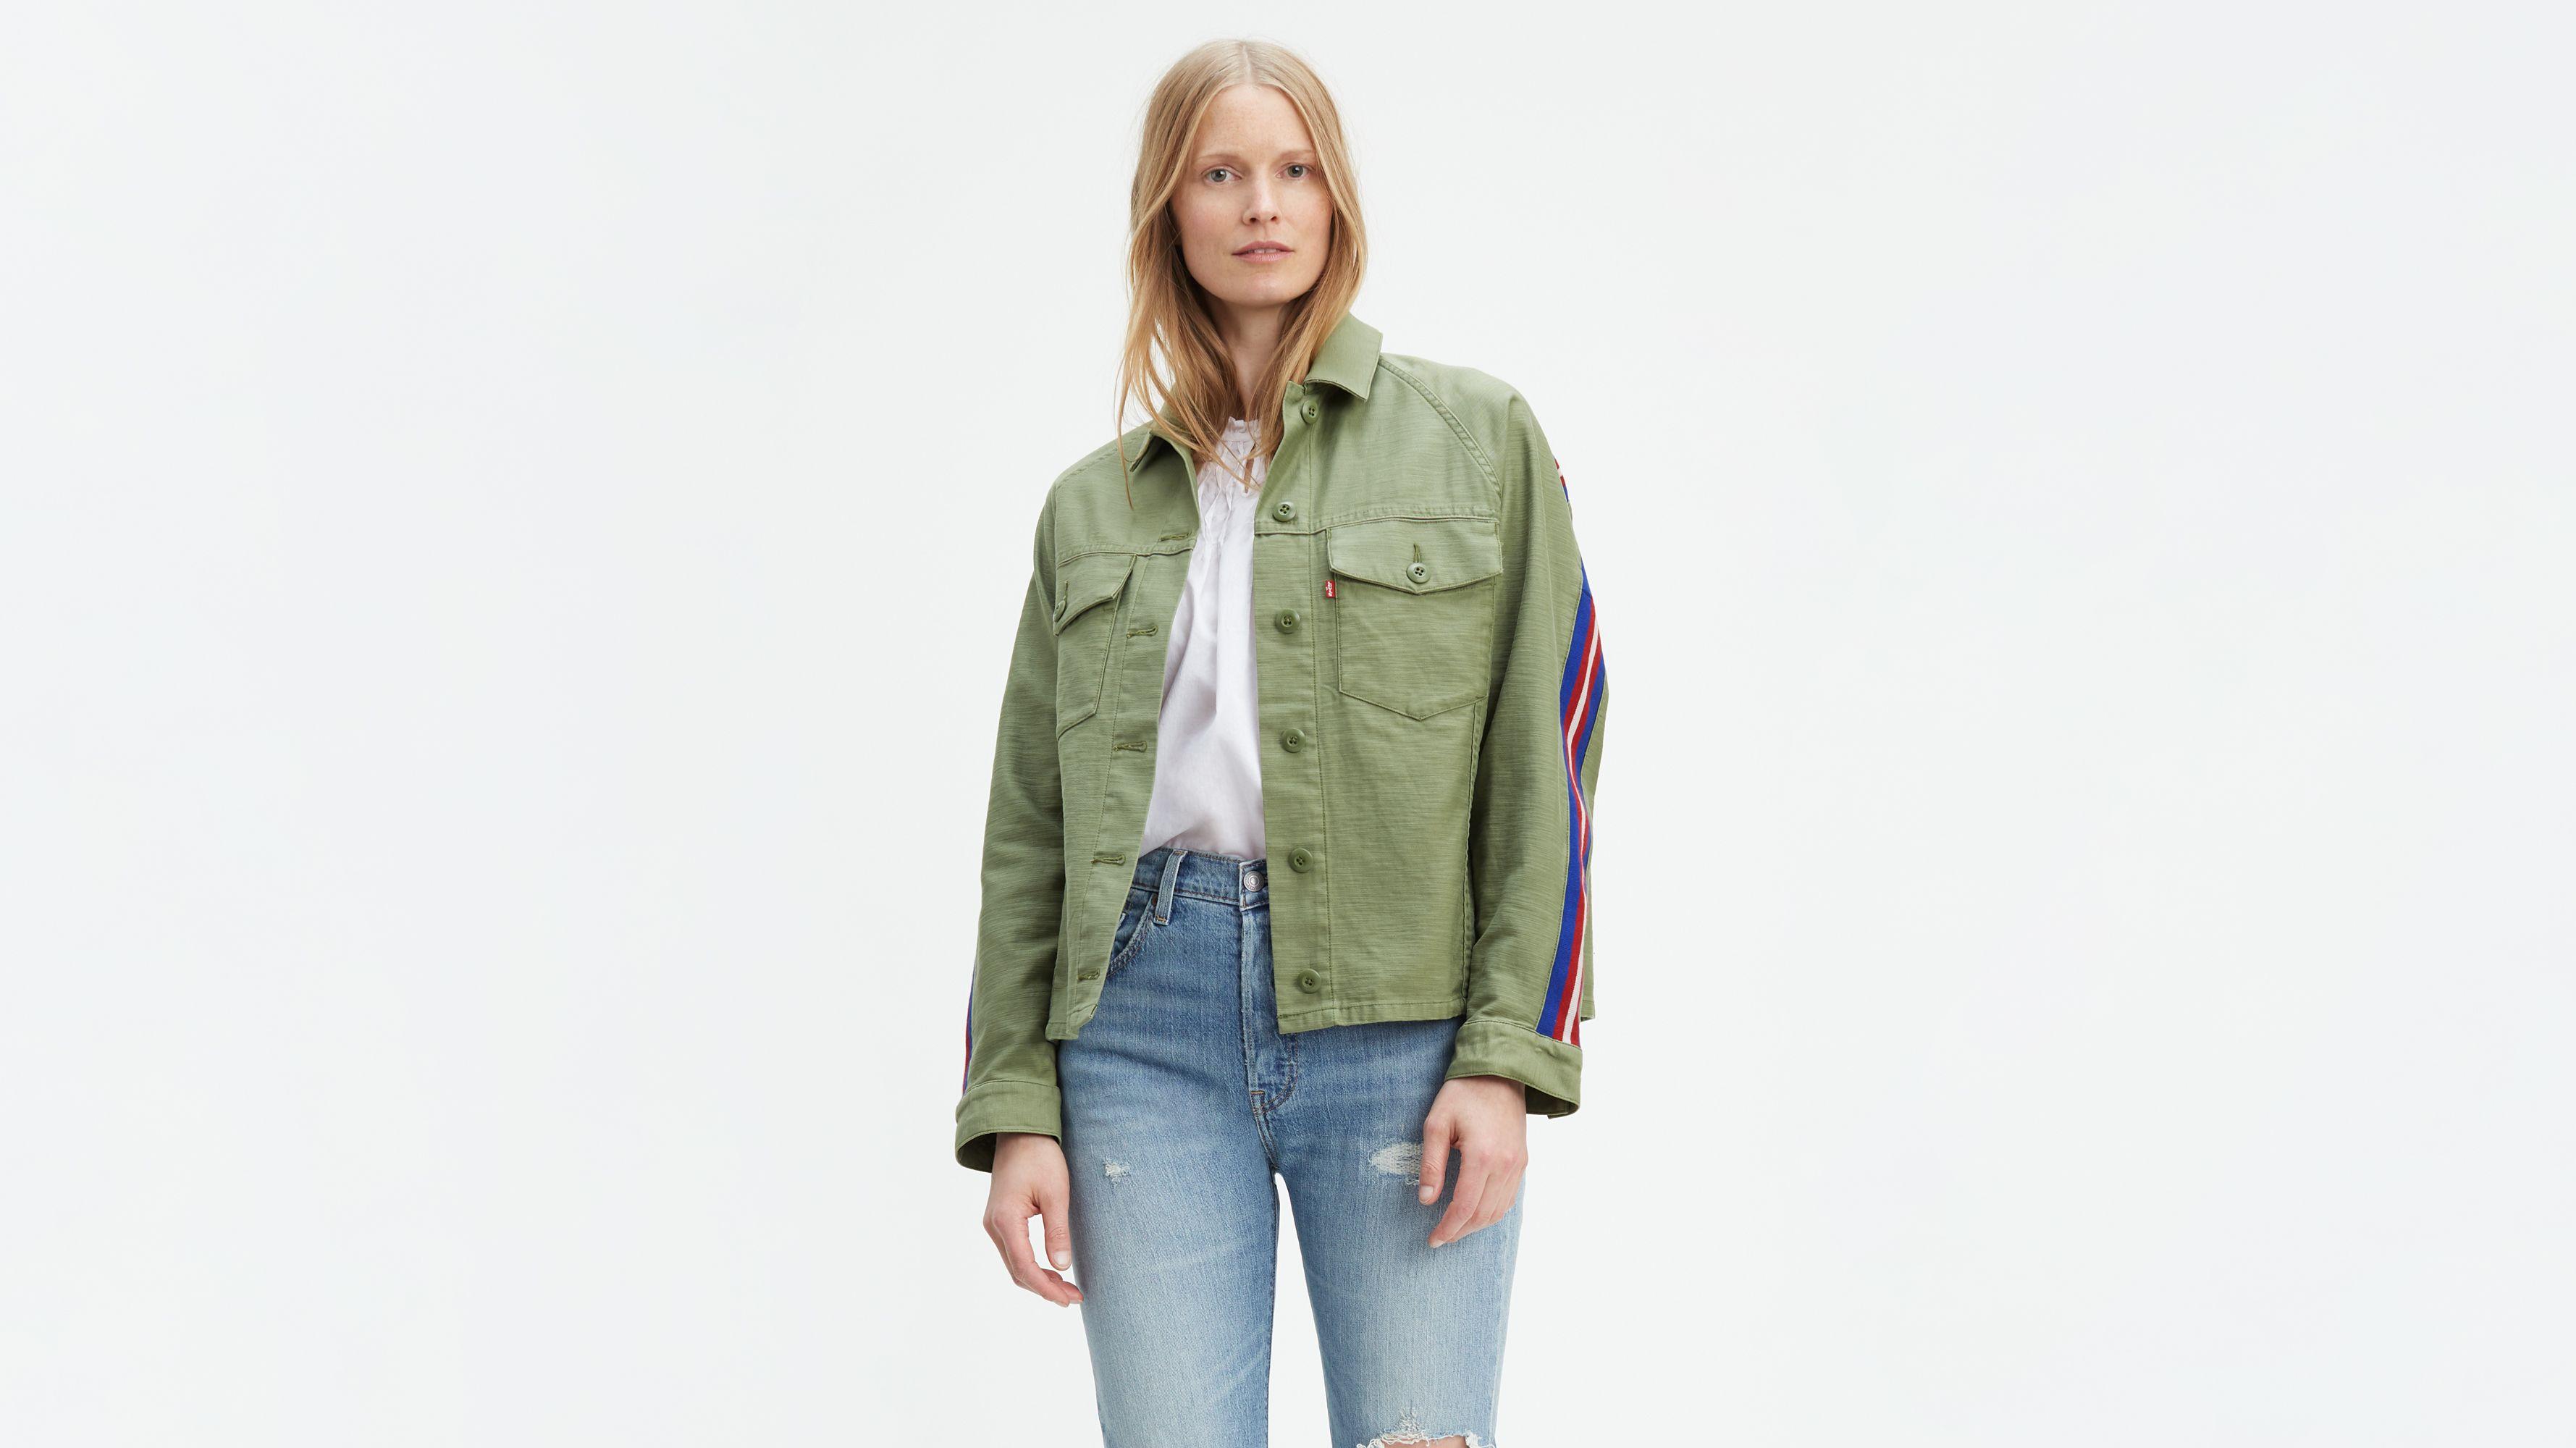 Levi's Jackets amp; Coats Women's Women's Coats qOYX1